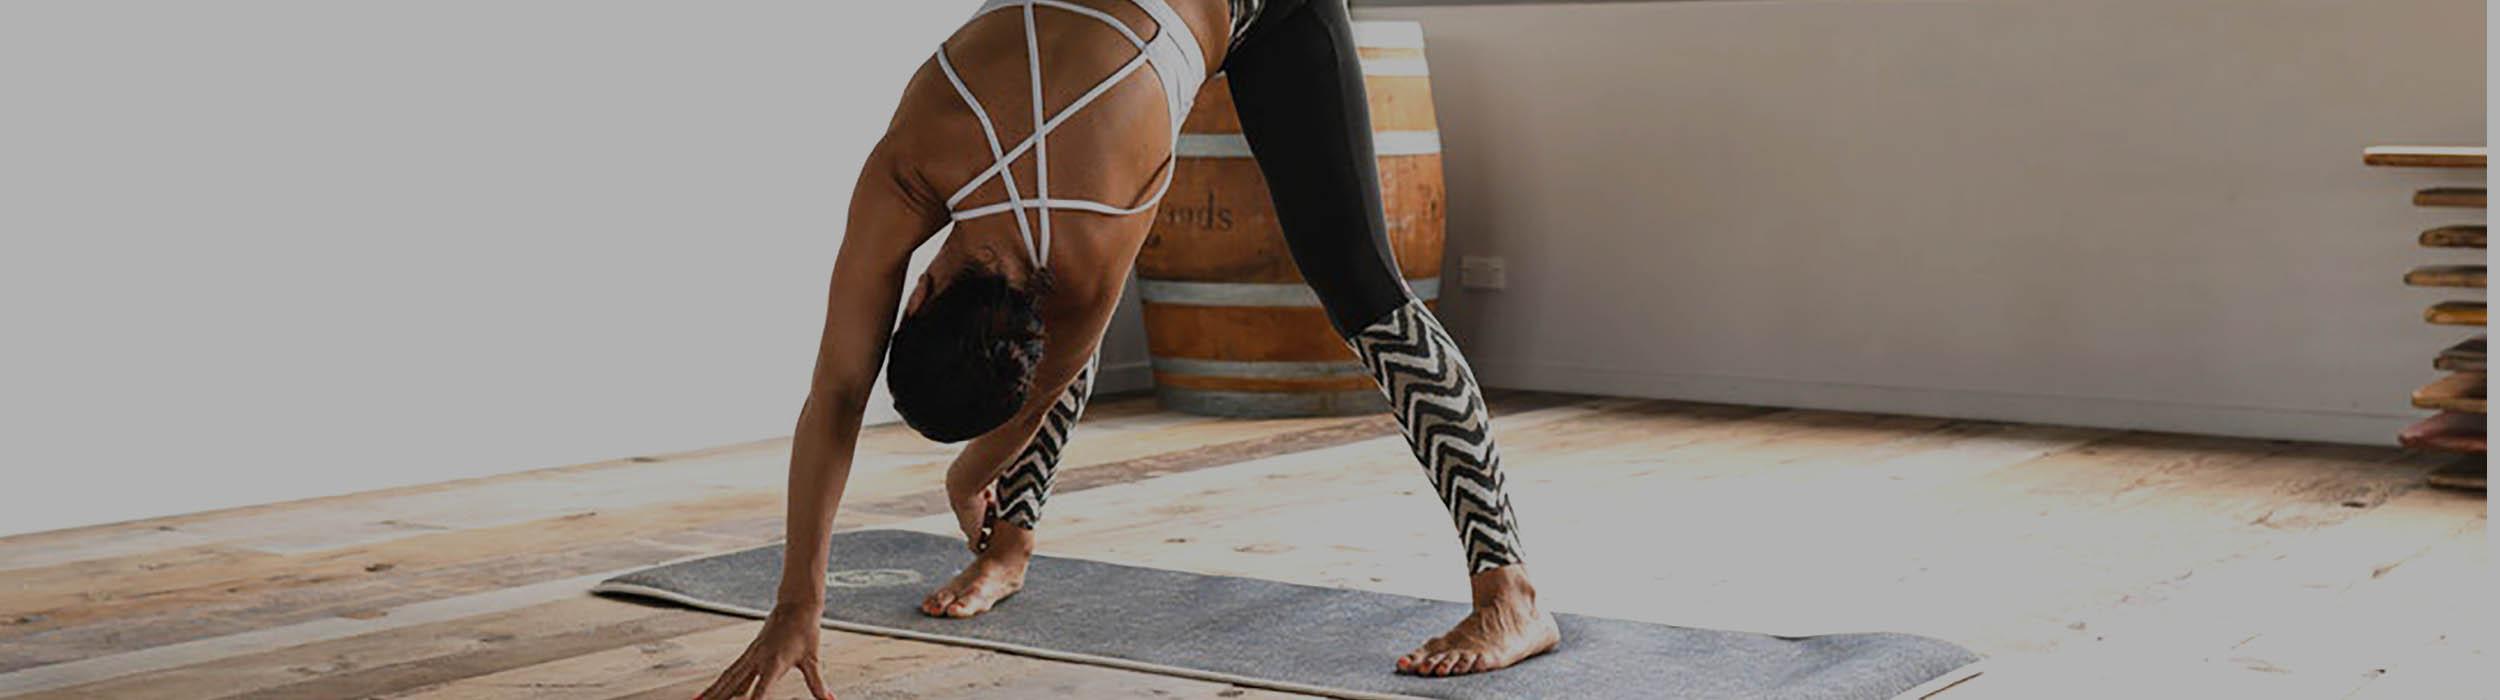 yogadocenten gezocht